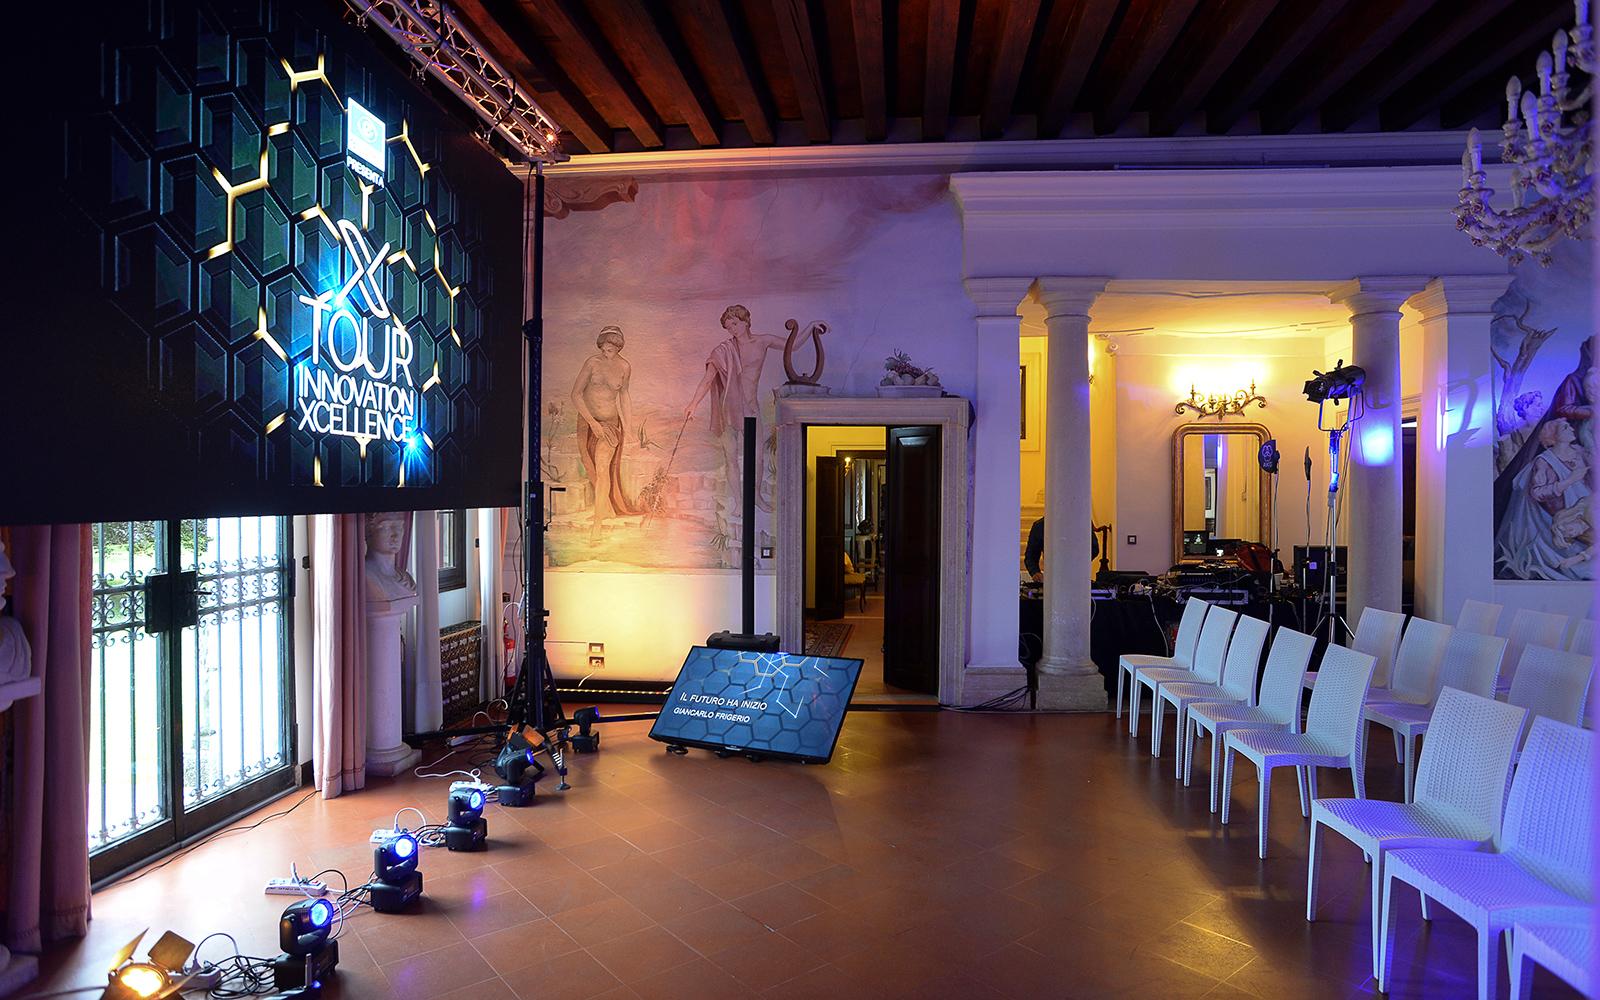 sala per meeting Vicenza, Sale per meeting Padova, Sala congressi Vicenza, Sala congressi Padova, Padova sala congresso